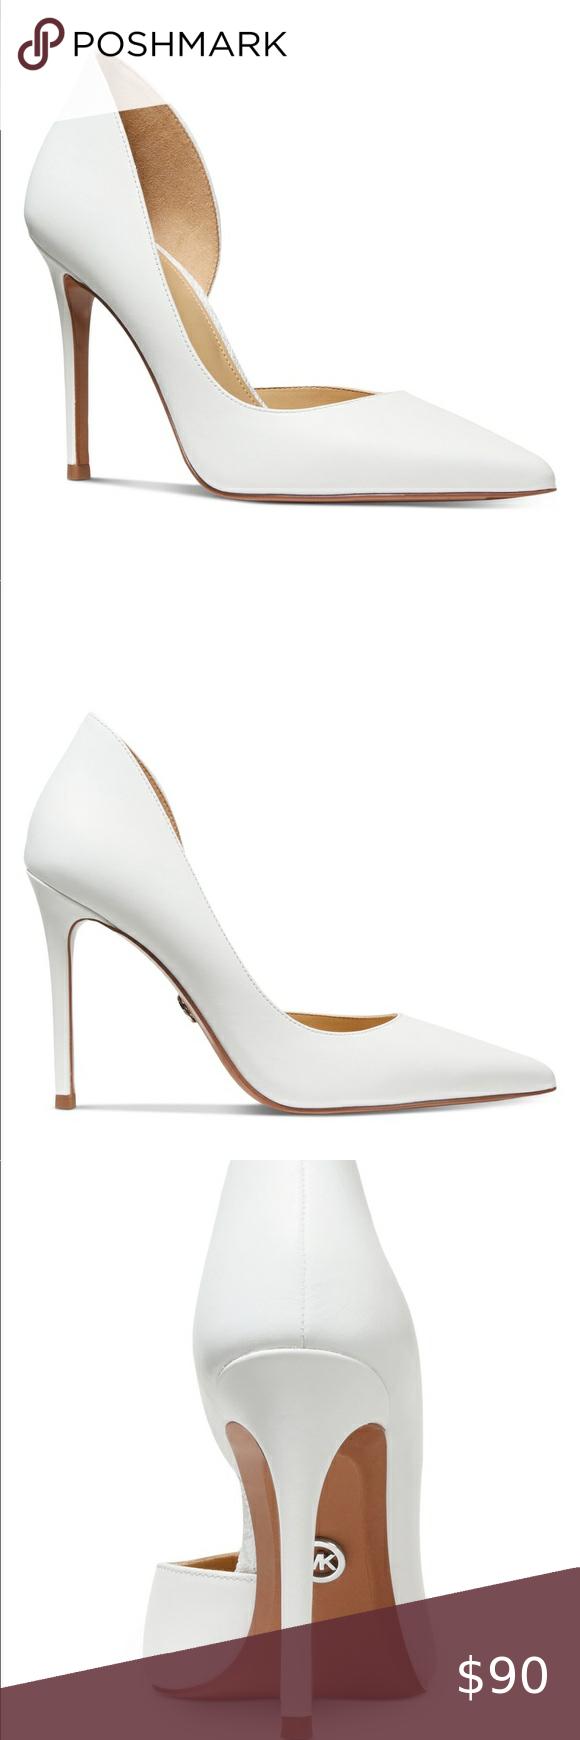 MK heels Michael Kors Shoes Heels